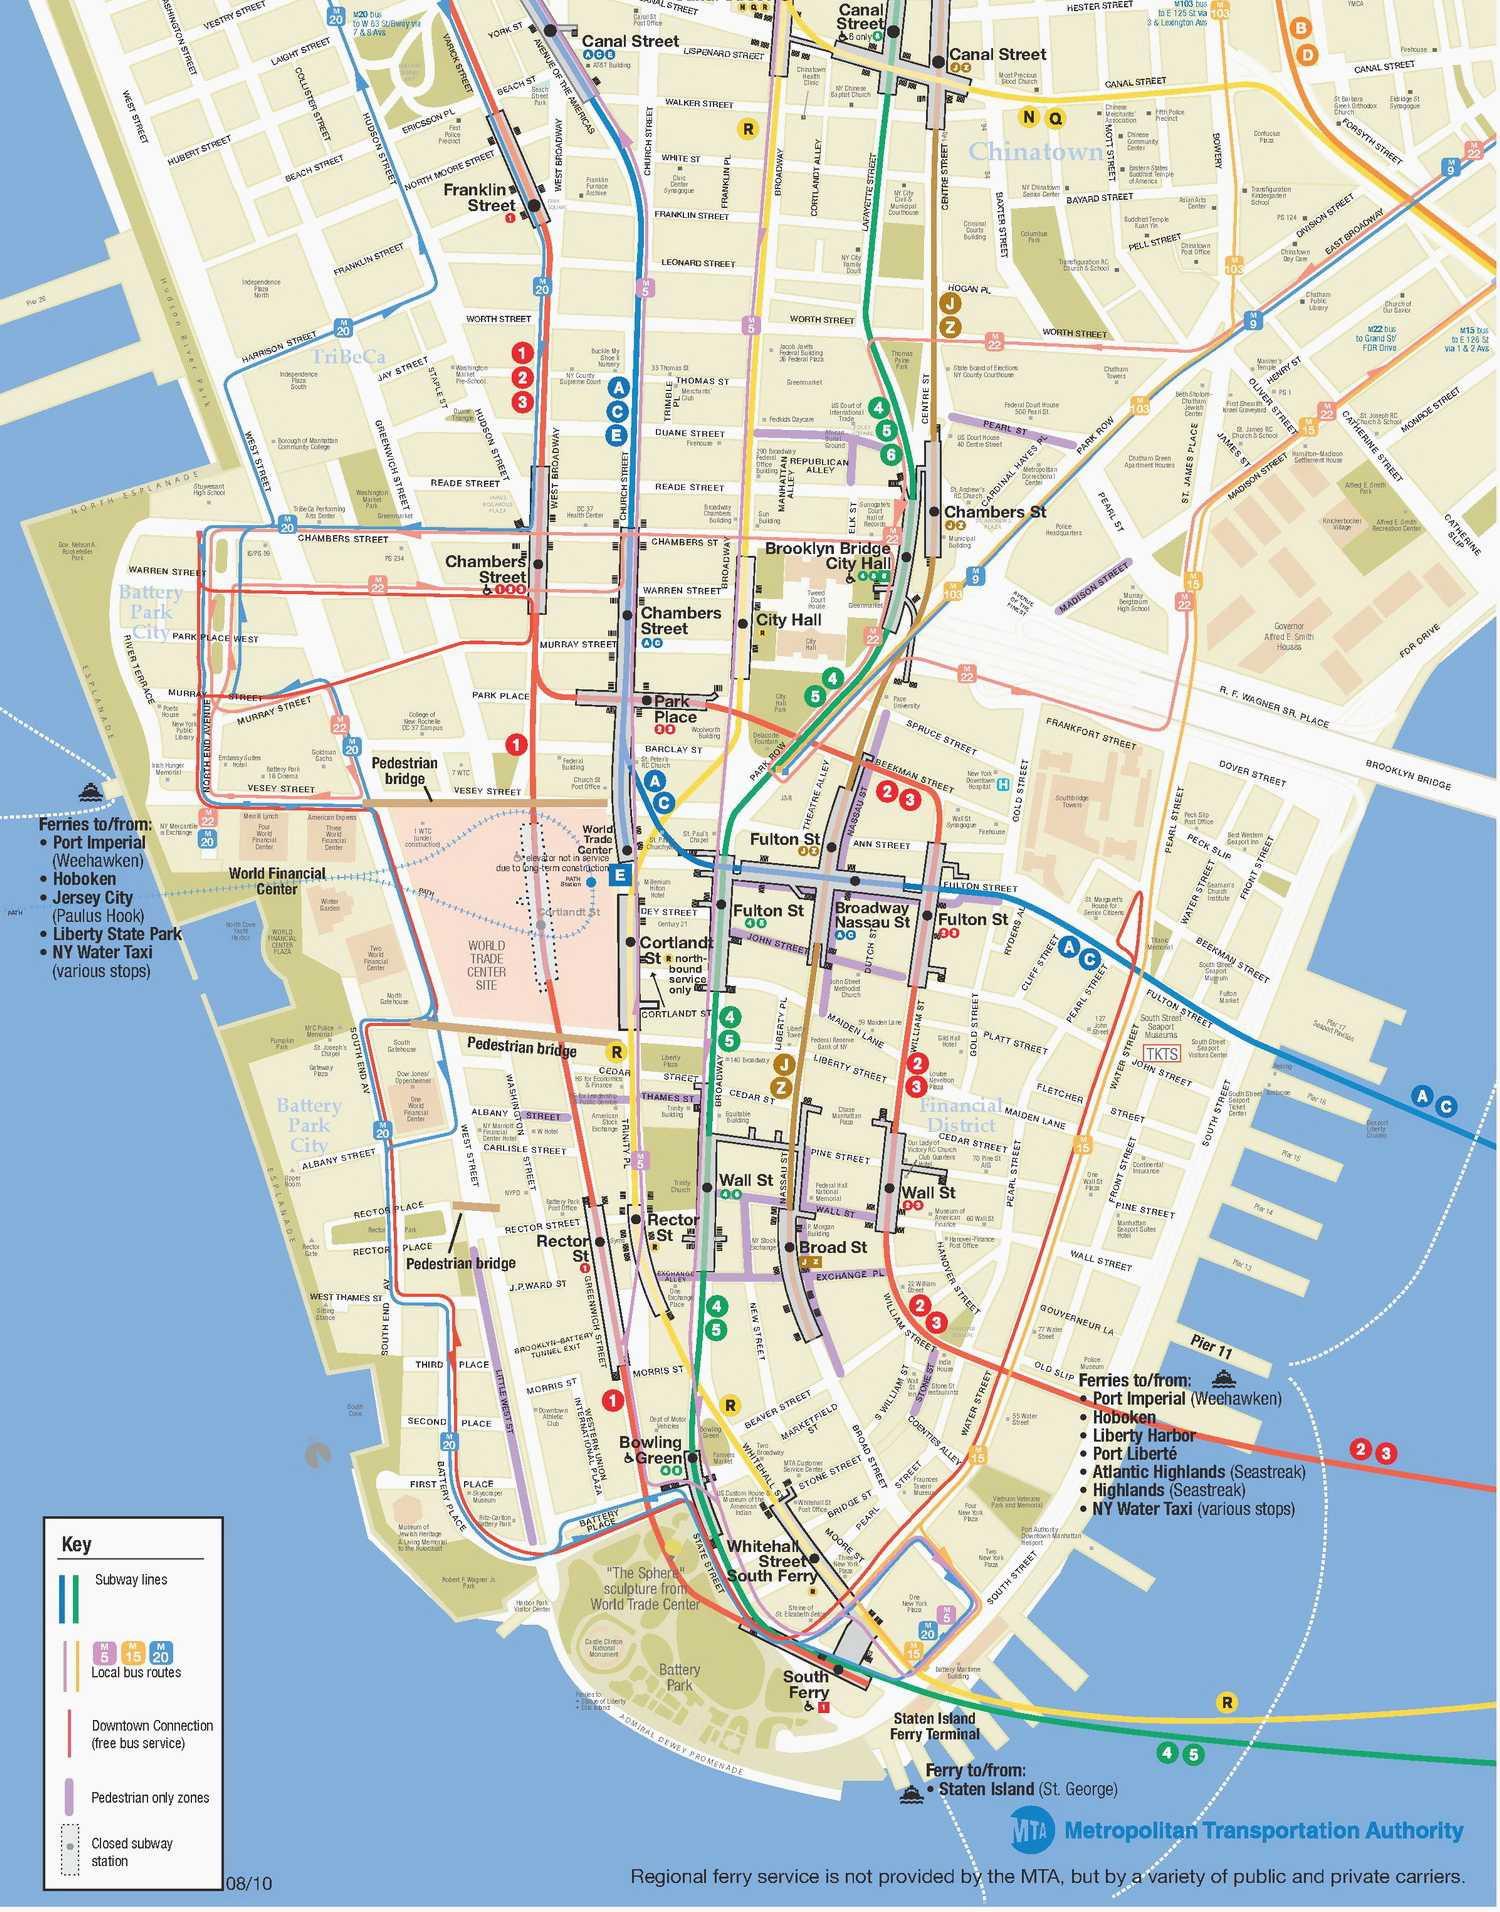 Mta Map New York Inspirational Nyc Subway Map Manhattan Ly - Nyc Subway Map Manhattan Only Printable